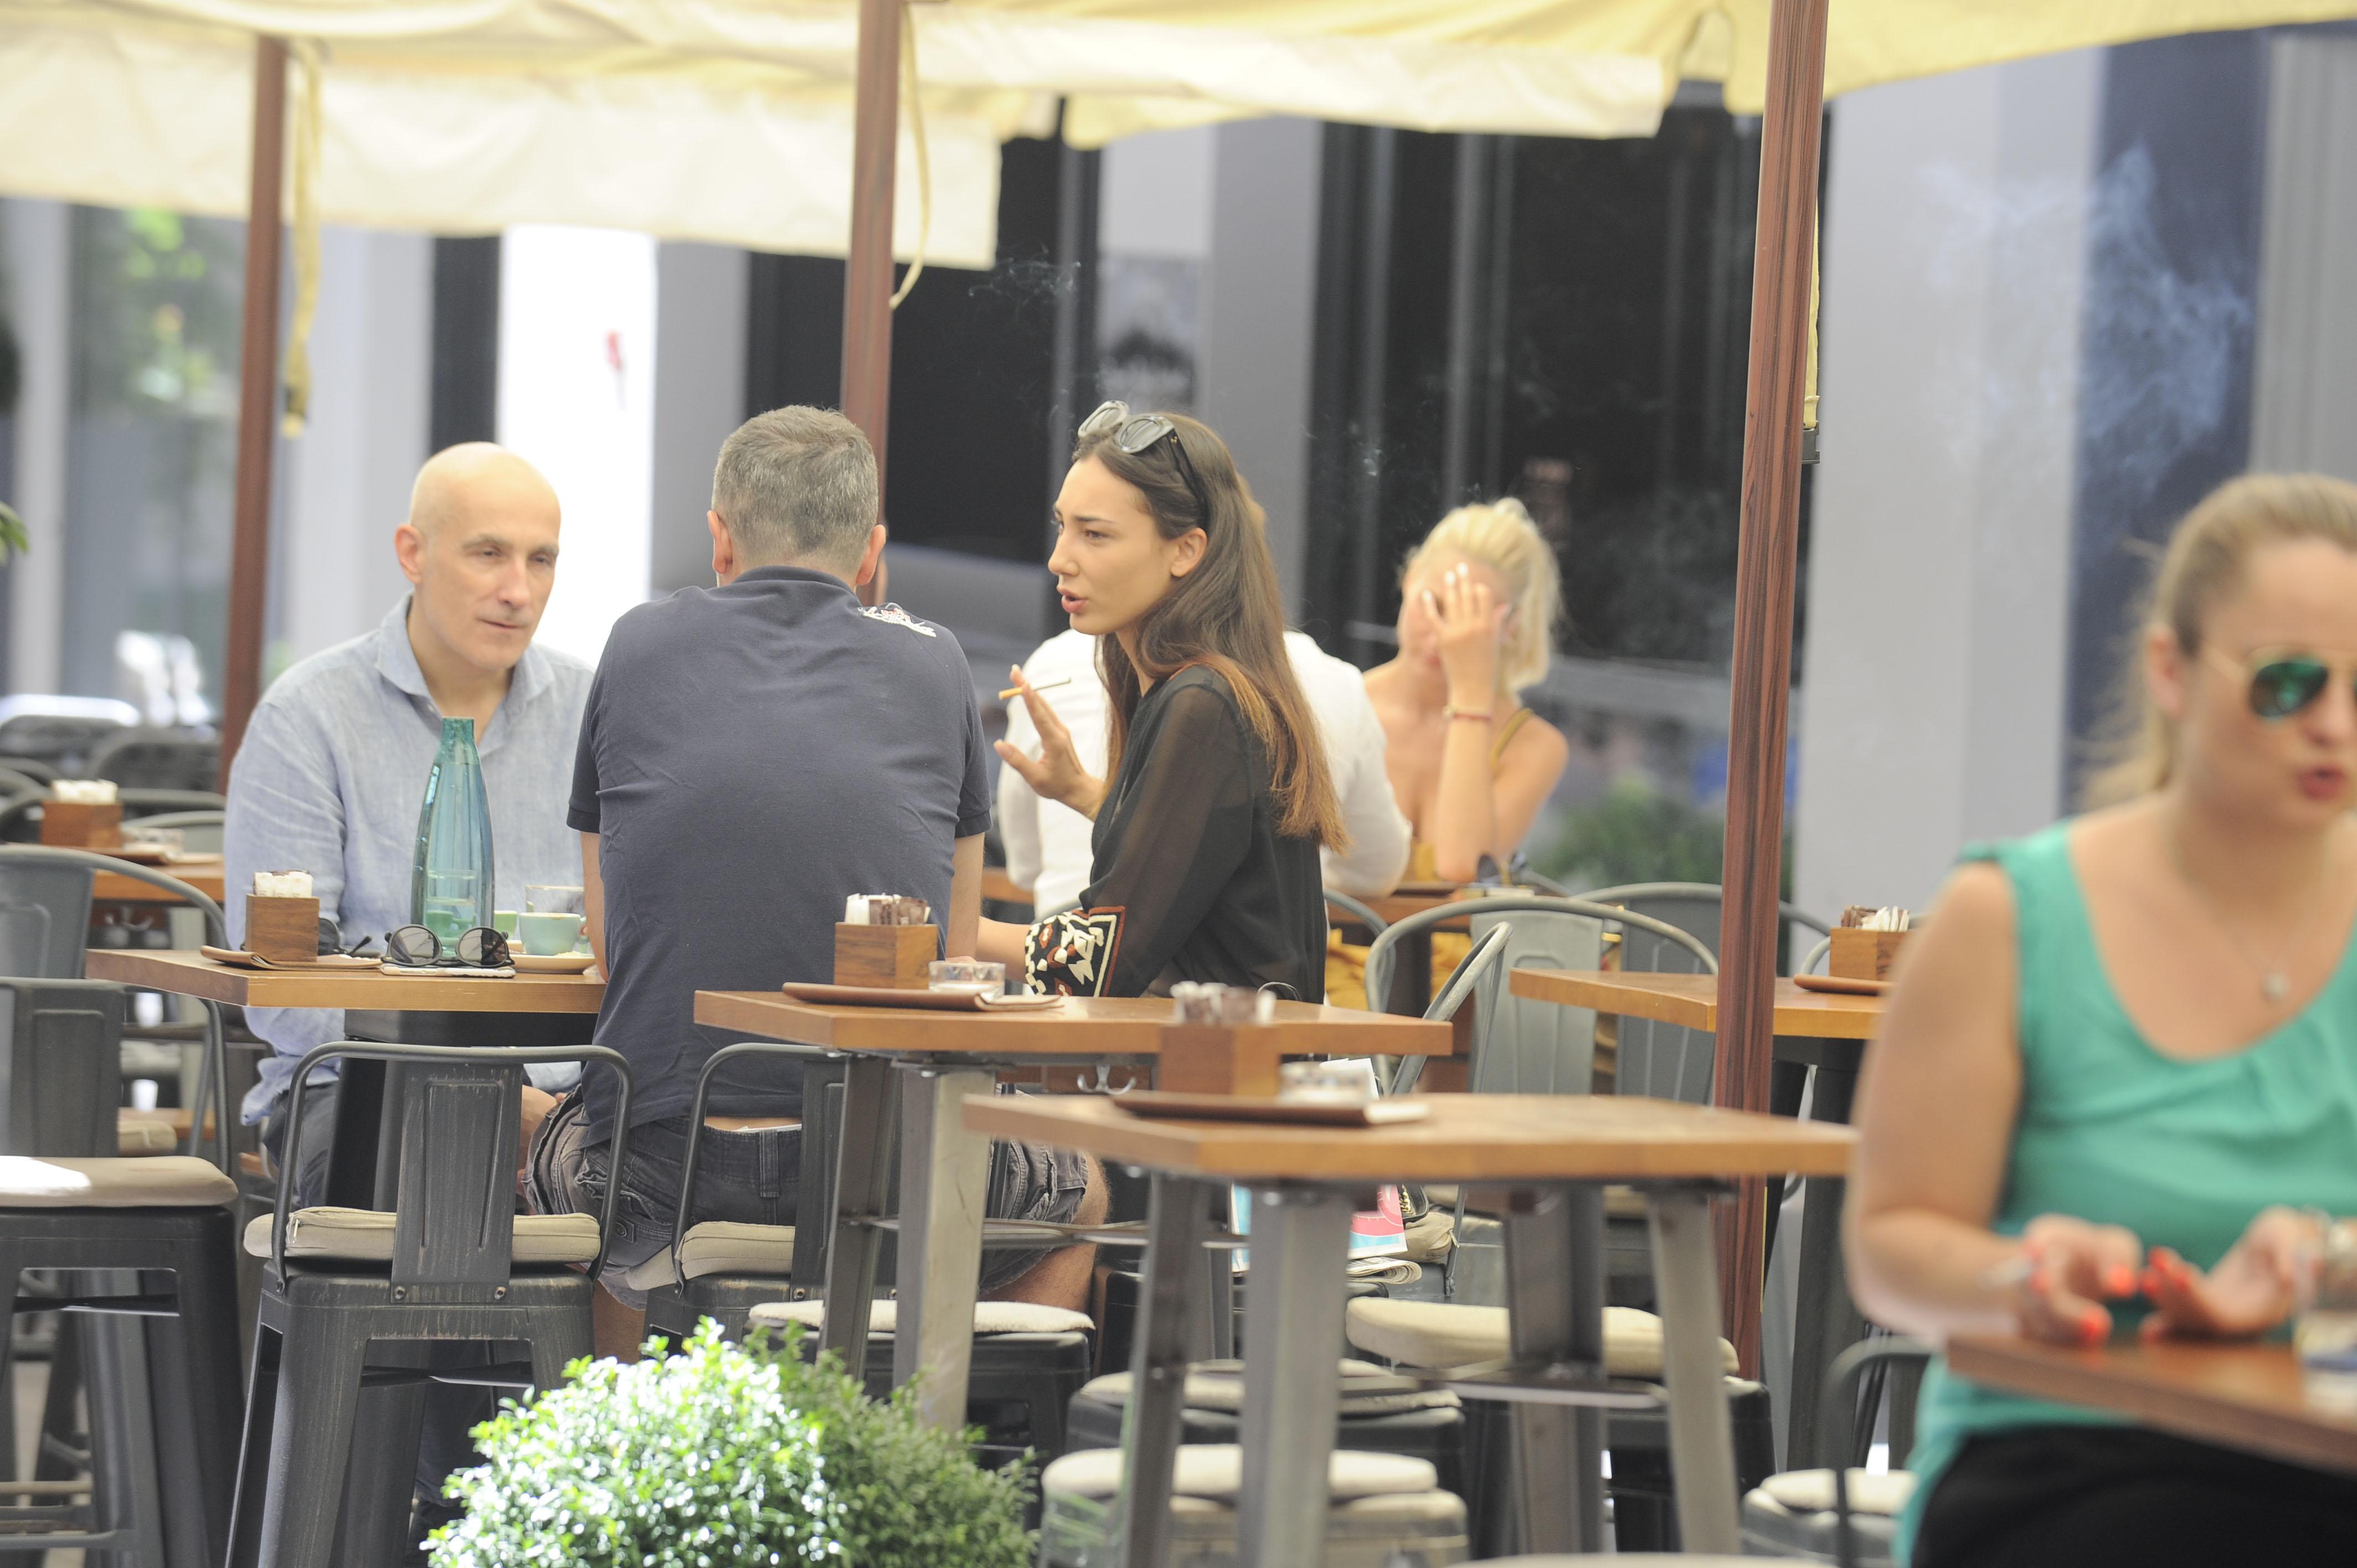 Spica / Zagreb 29.07.2017. / foto: Davor Matota / Josko Lokas i djevojka Jelena Katarina Kapa